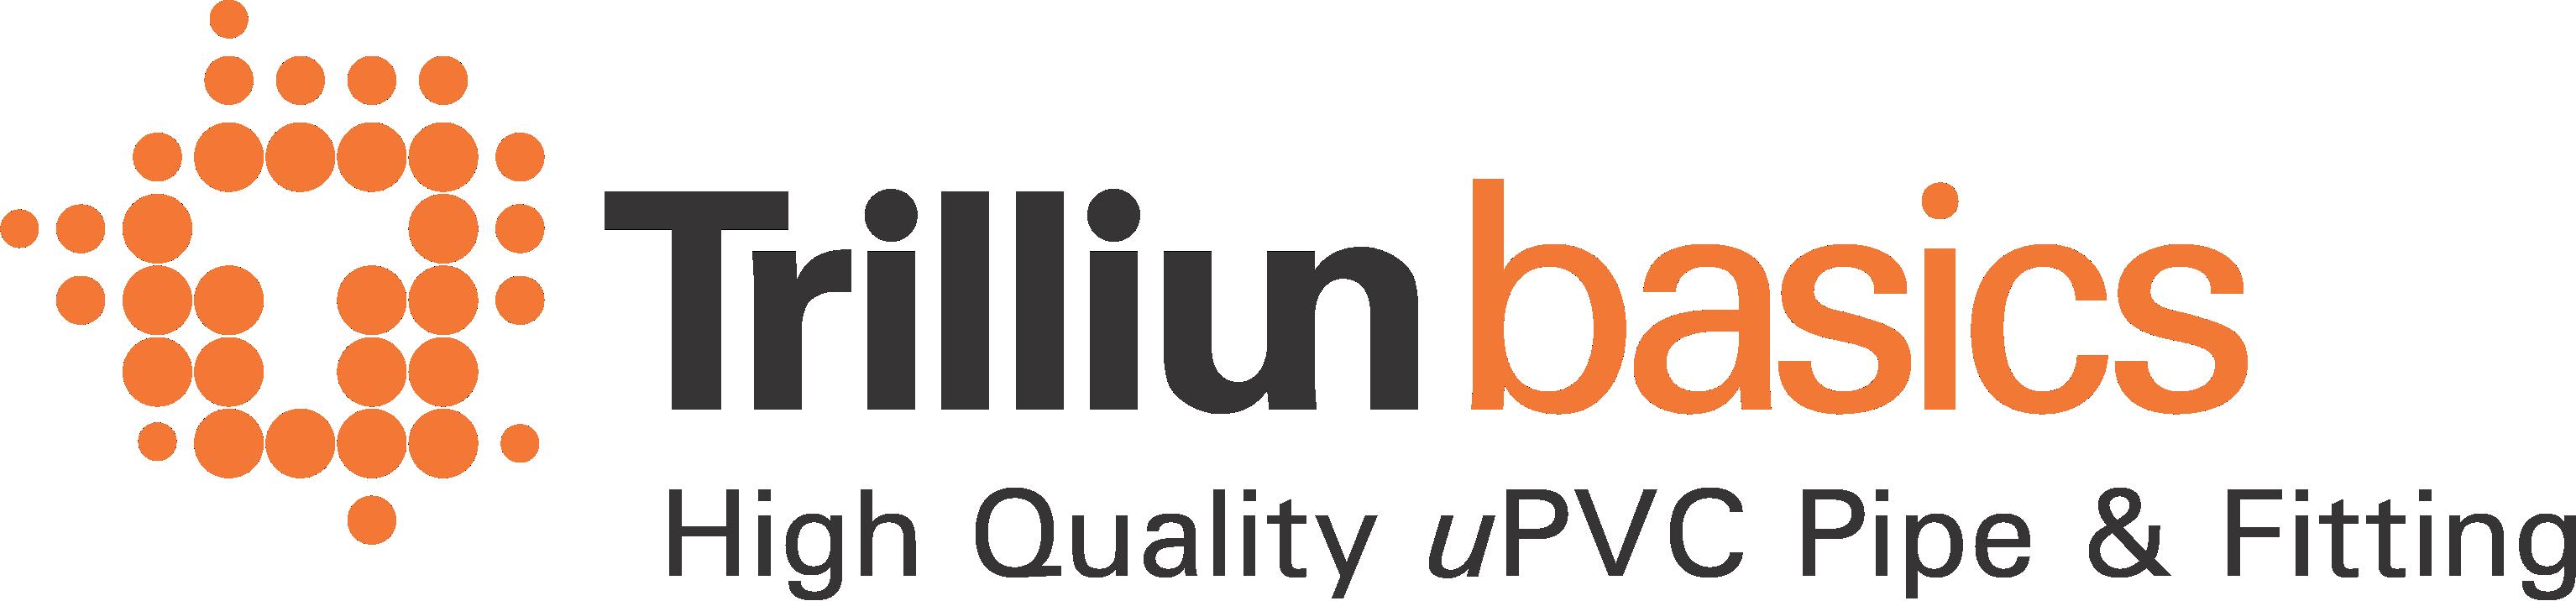 Trilliun Basic